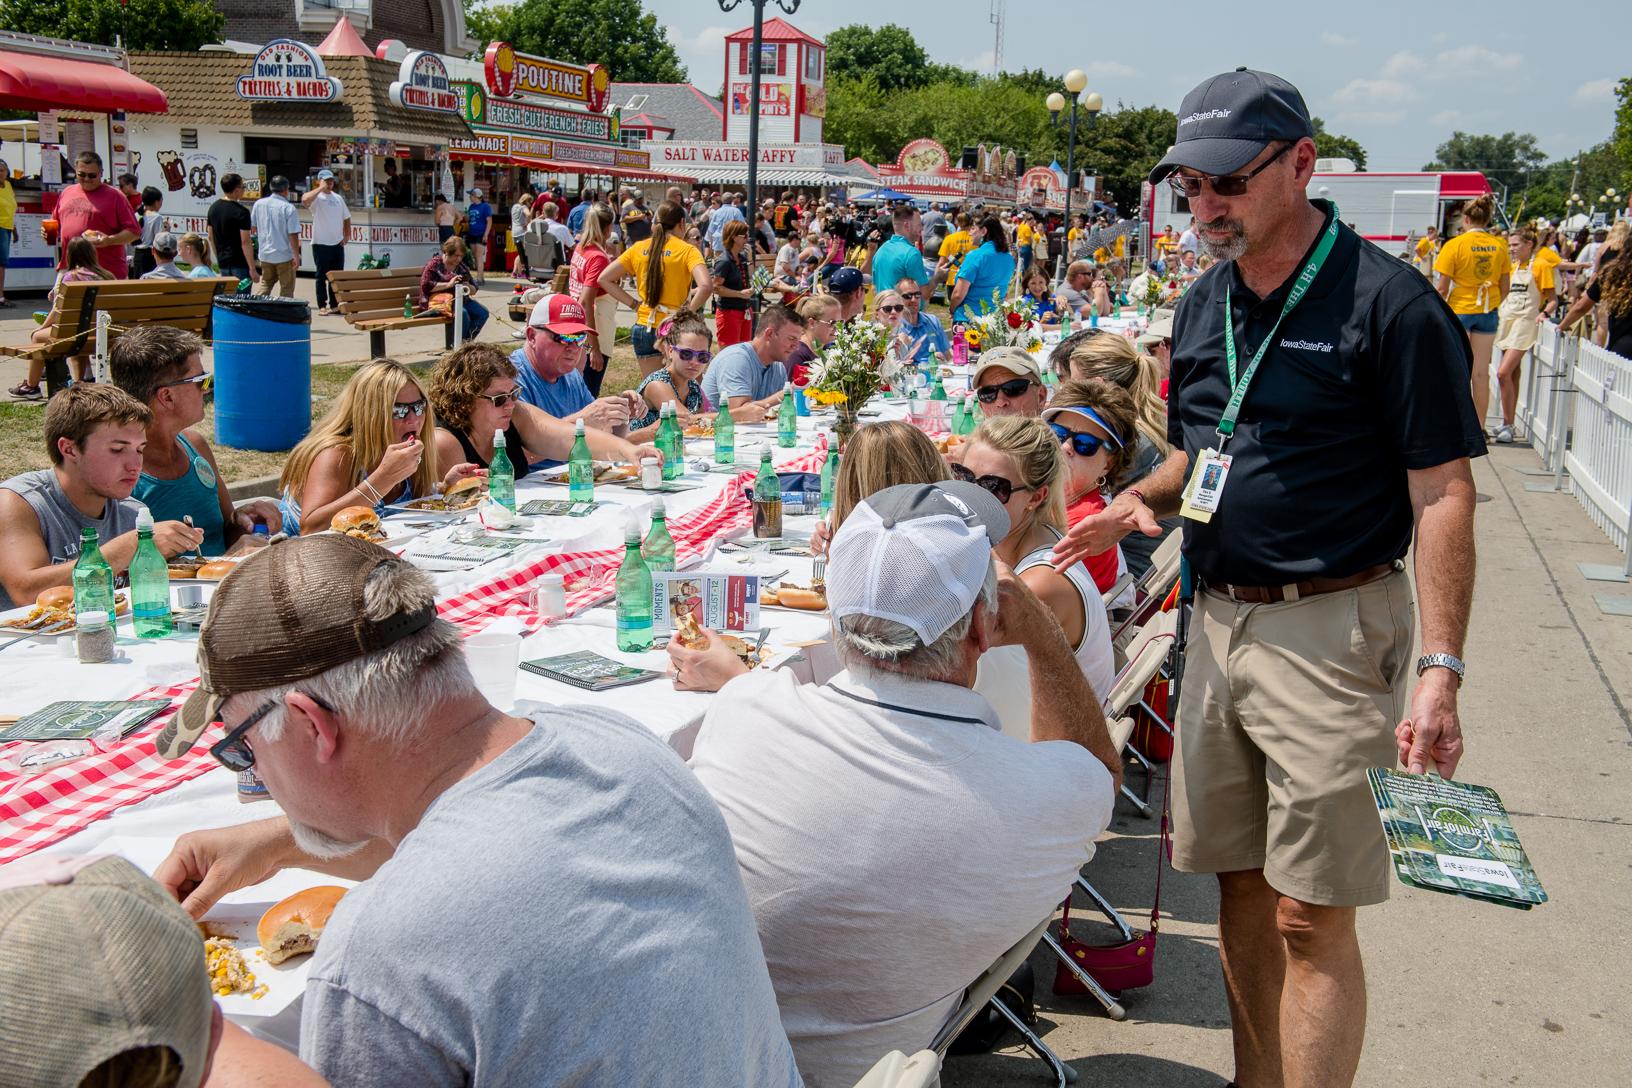 Gary Slater, CEO of the Iowa state Fair, greets Farm to Fair guests. Photo credit: Joseph L. Murphy/Iowa Soybean Association